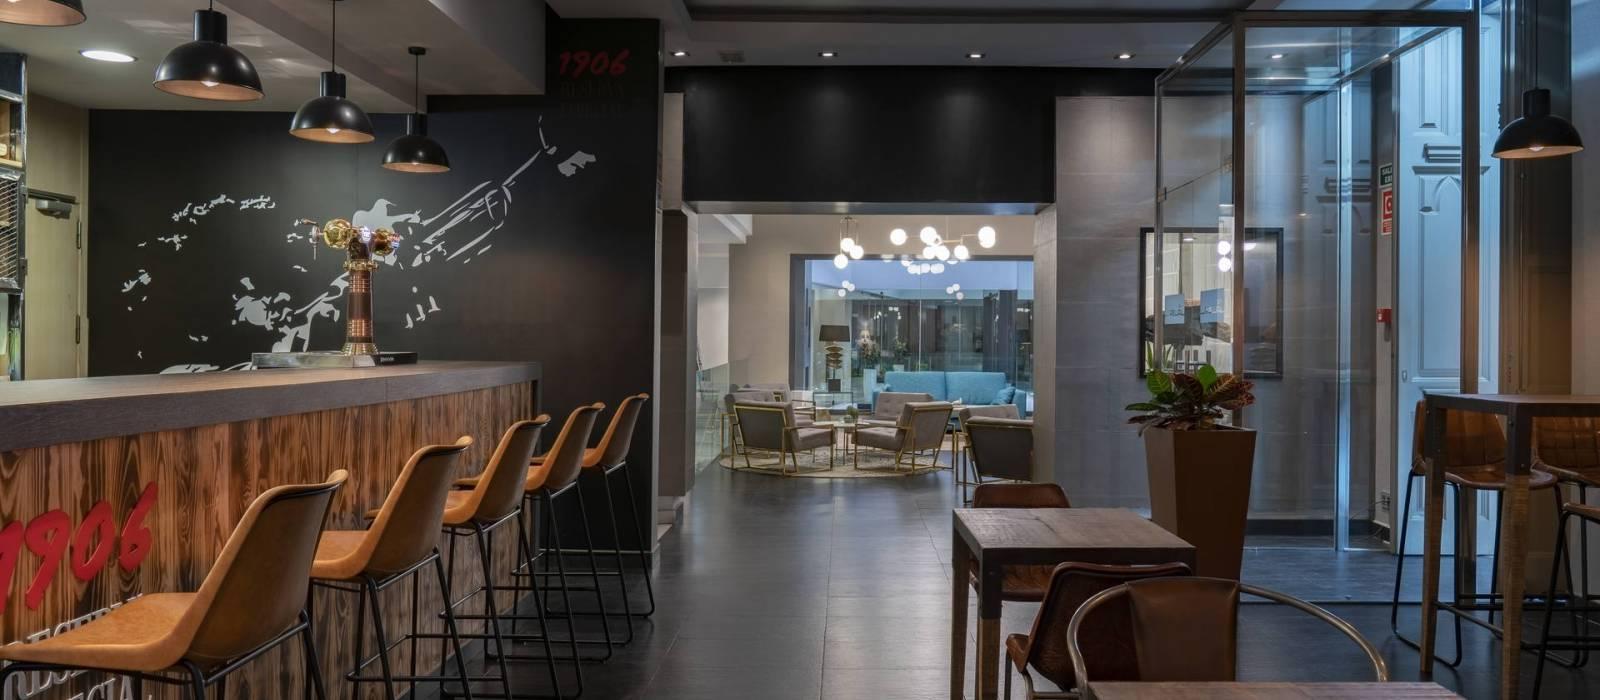 The Wall Bar Hotel Málaga Posada del patio - Vincci Hotels